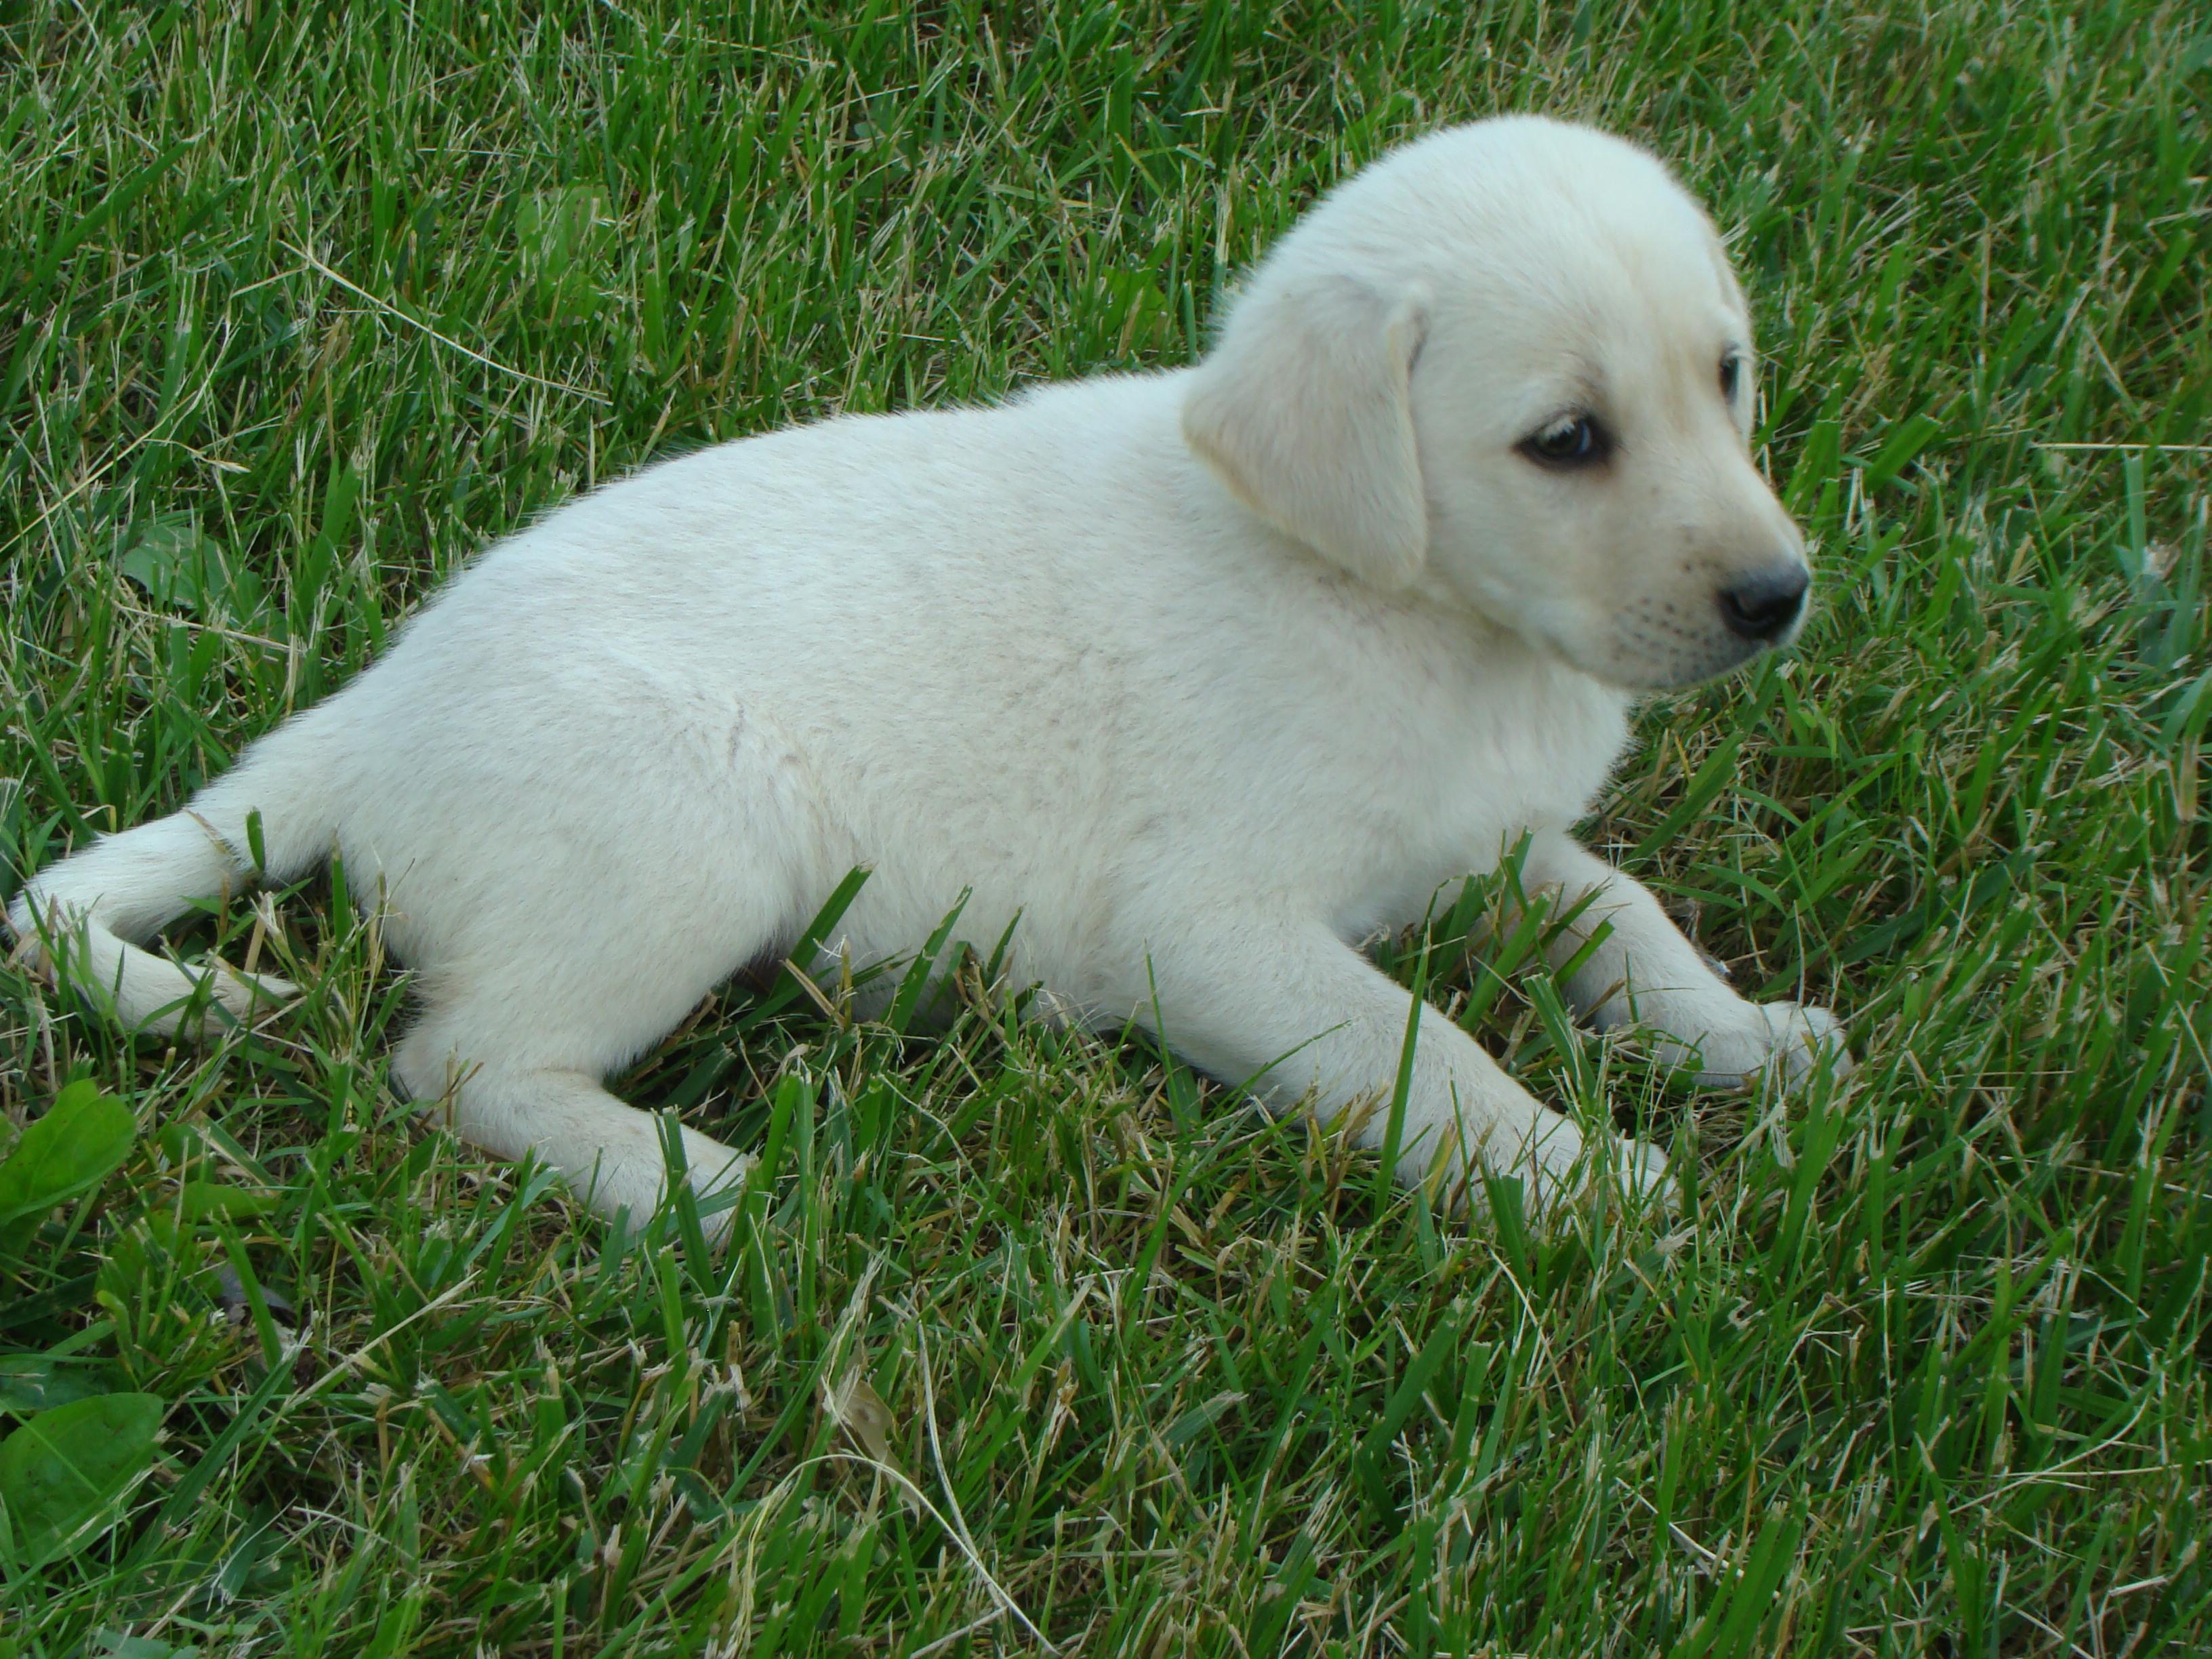 AKC WHITE LAB PUPPIES | Michigan Sportsman - Online Michigan Hunting